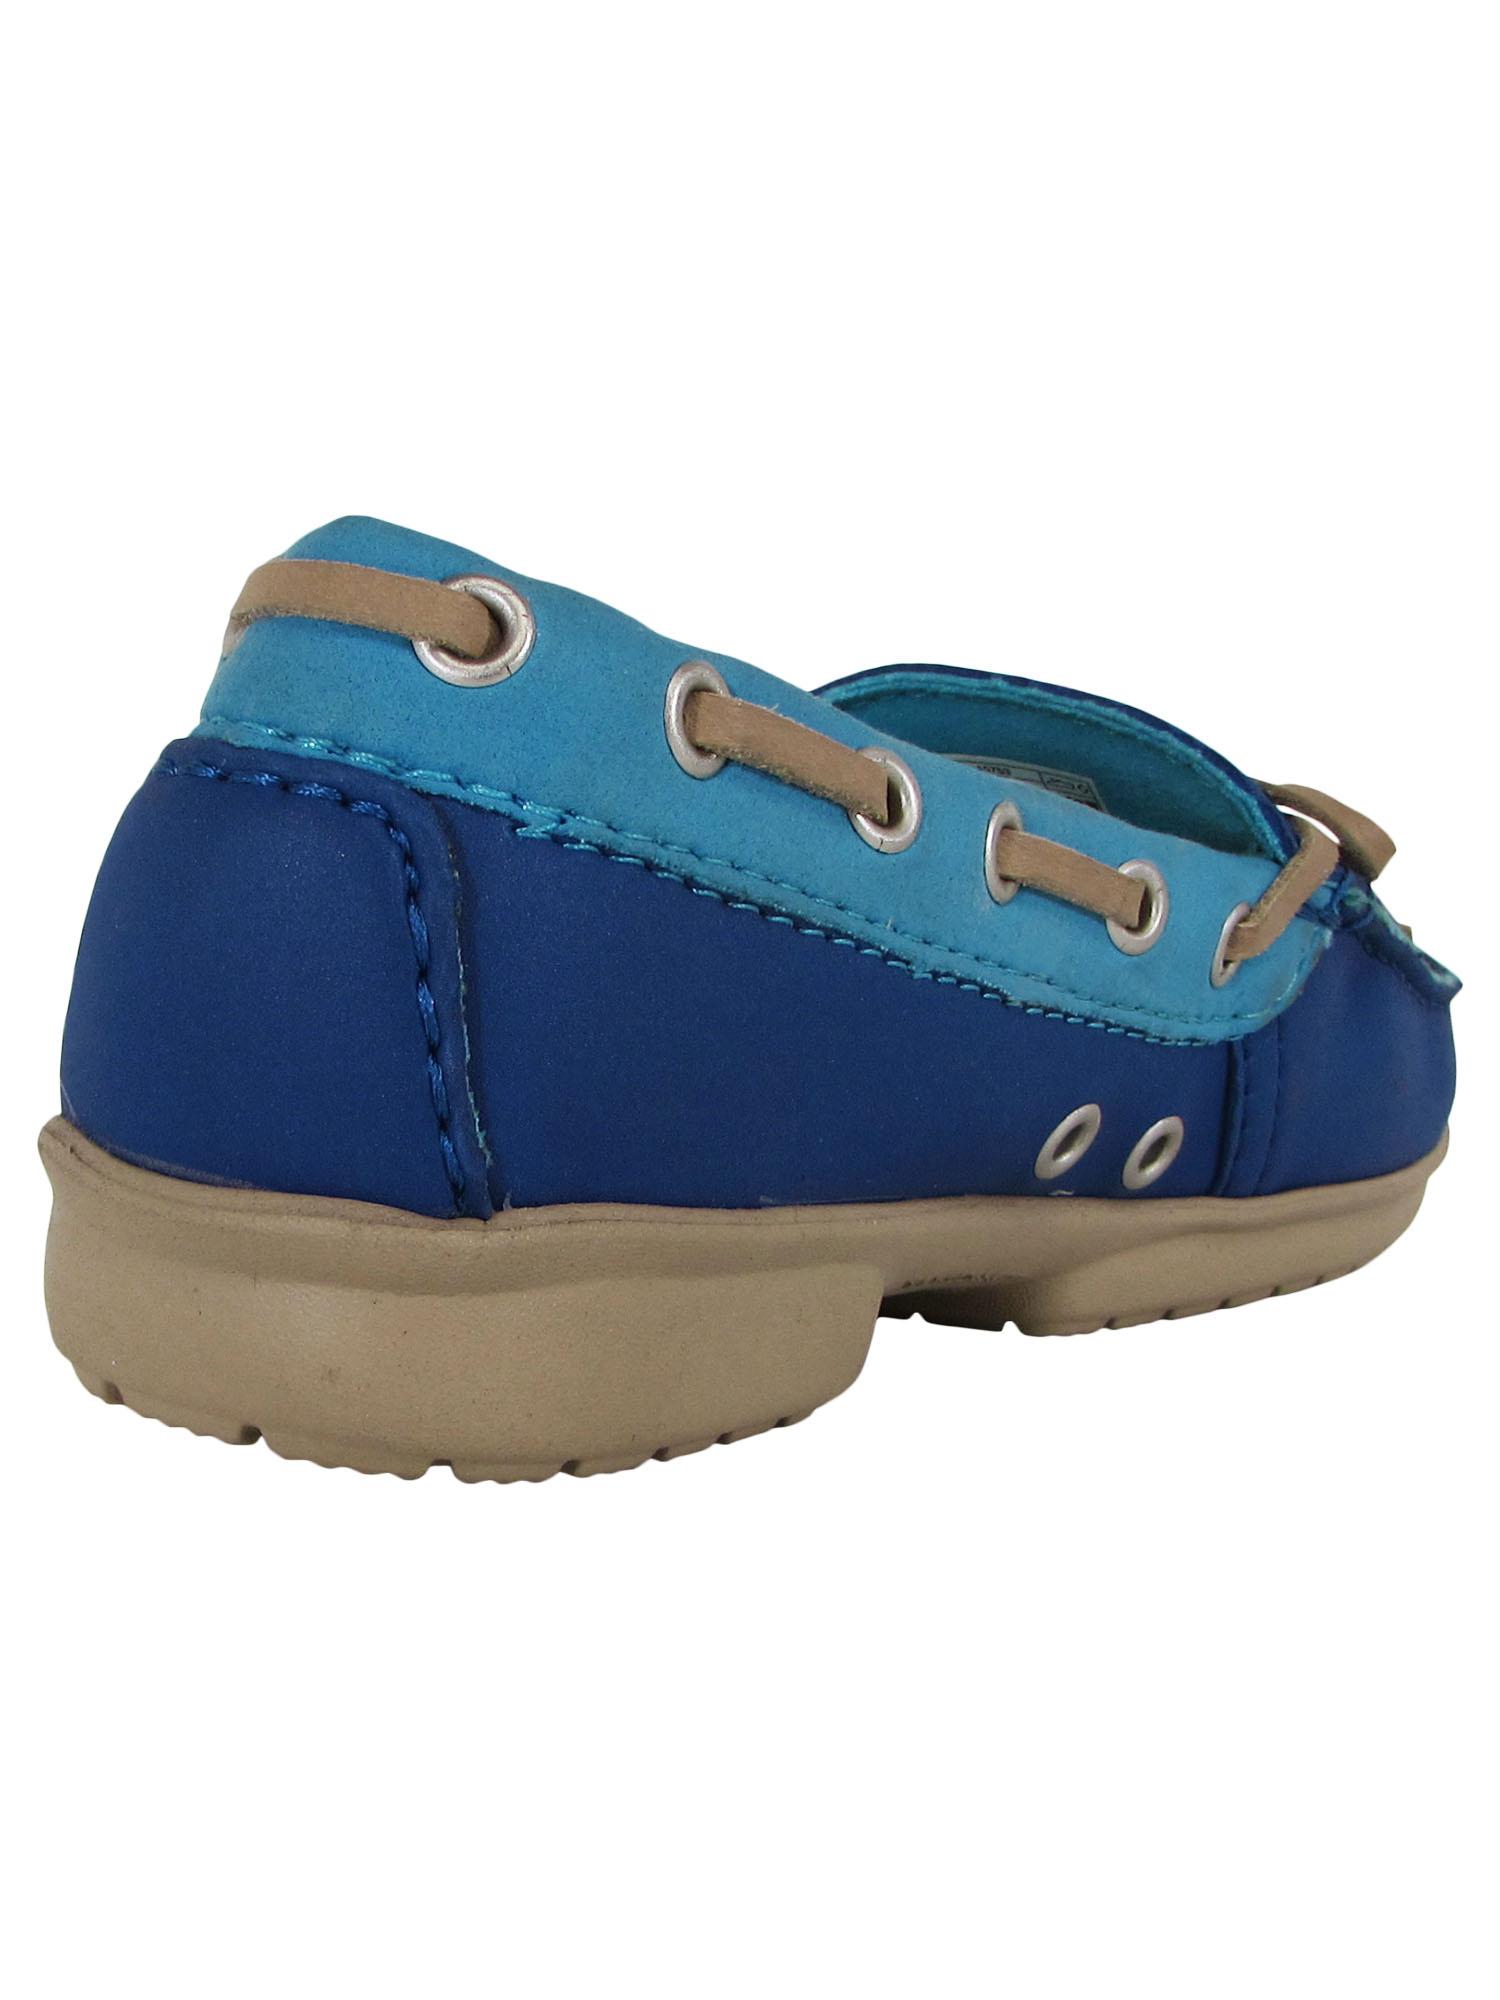 Crocs-Womens-Wrap-ColorLite-Loafer-Shoes thumbnail 4